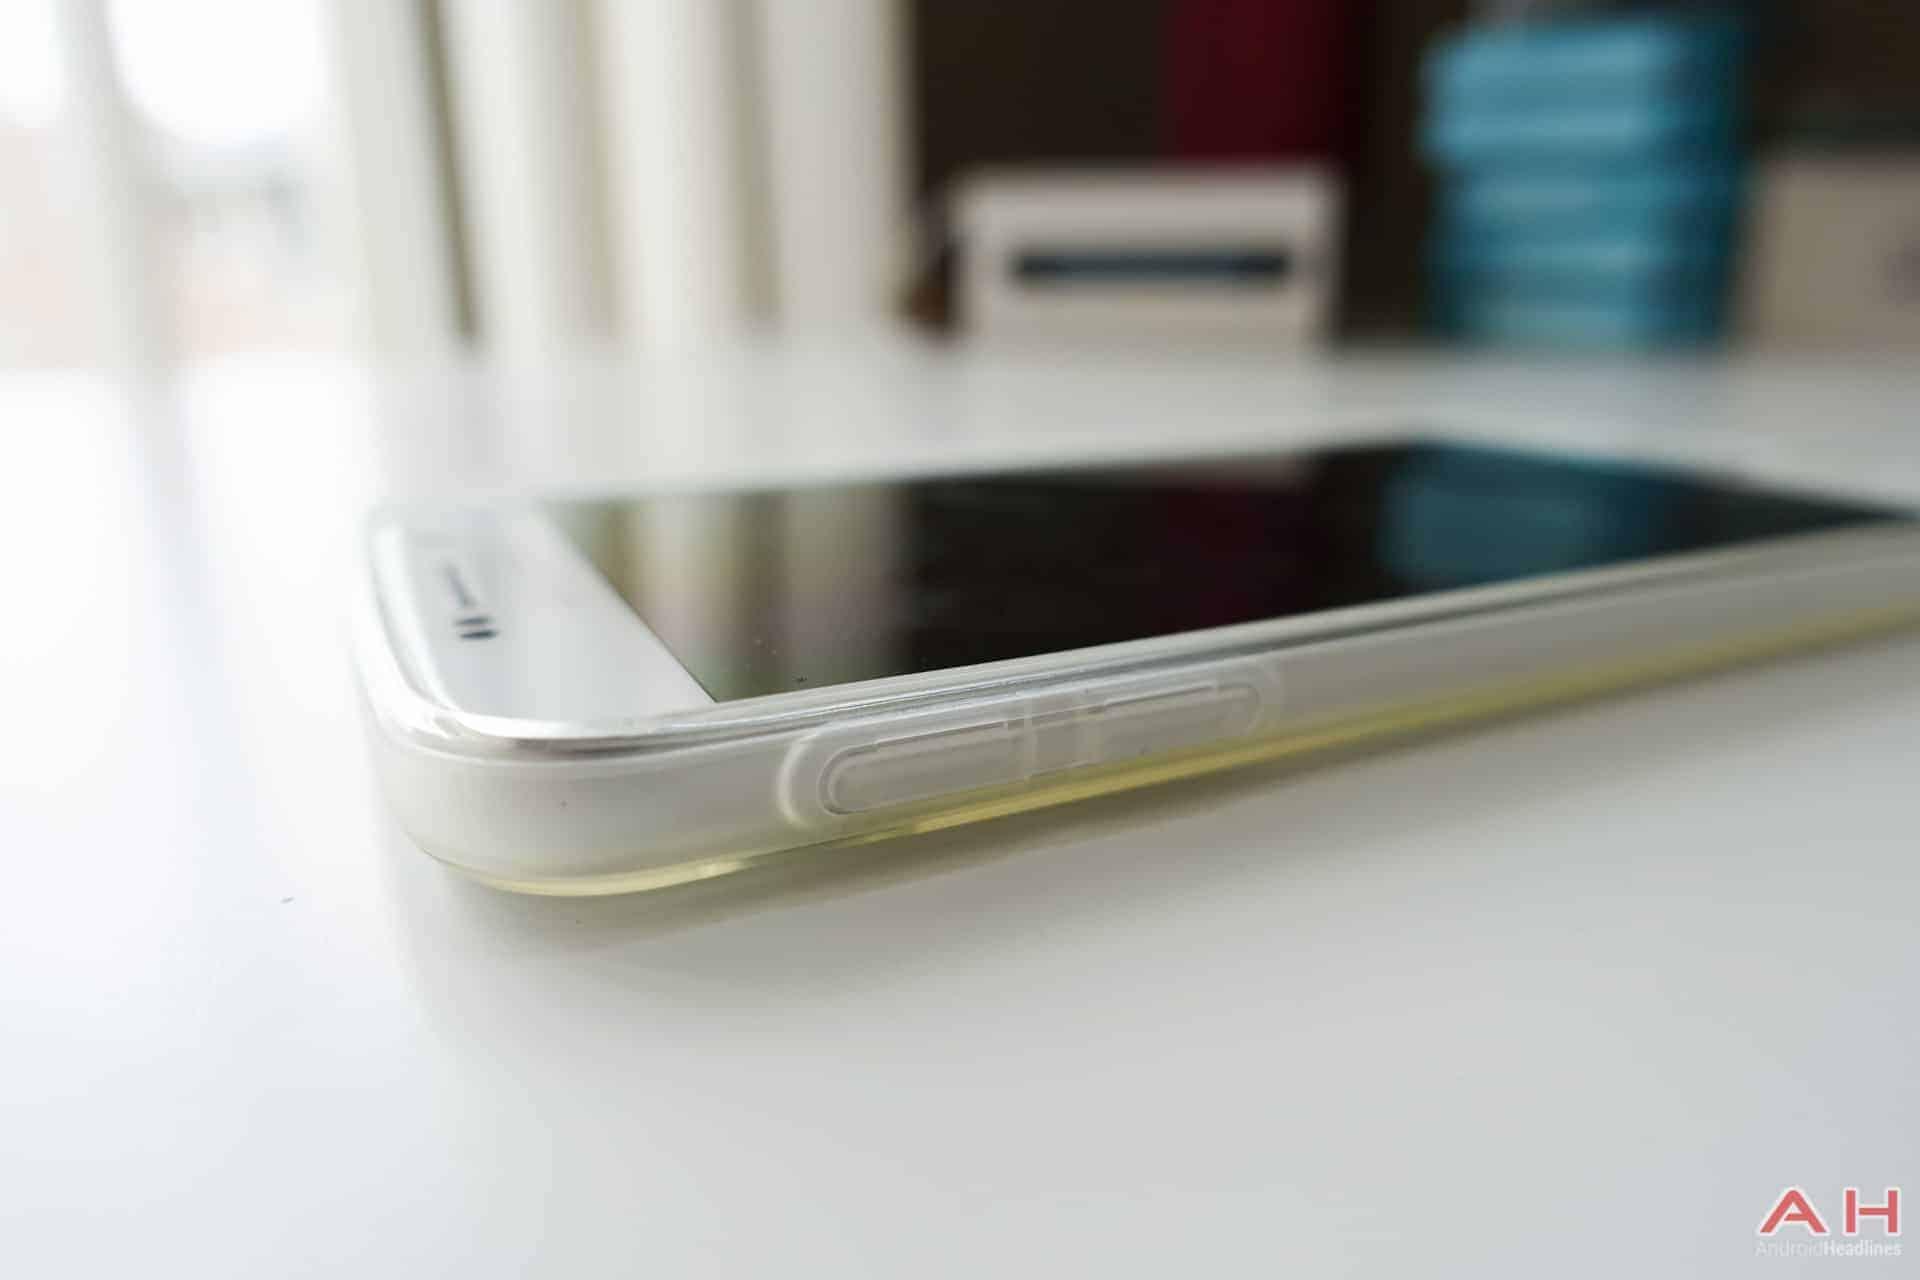 Samsung Galaxy S6 Verus Crystal Light Case AH 8